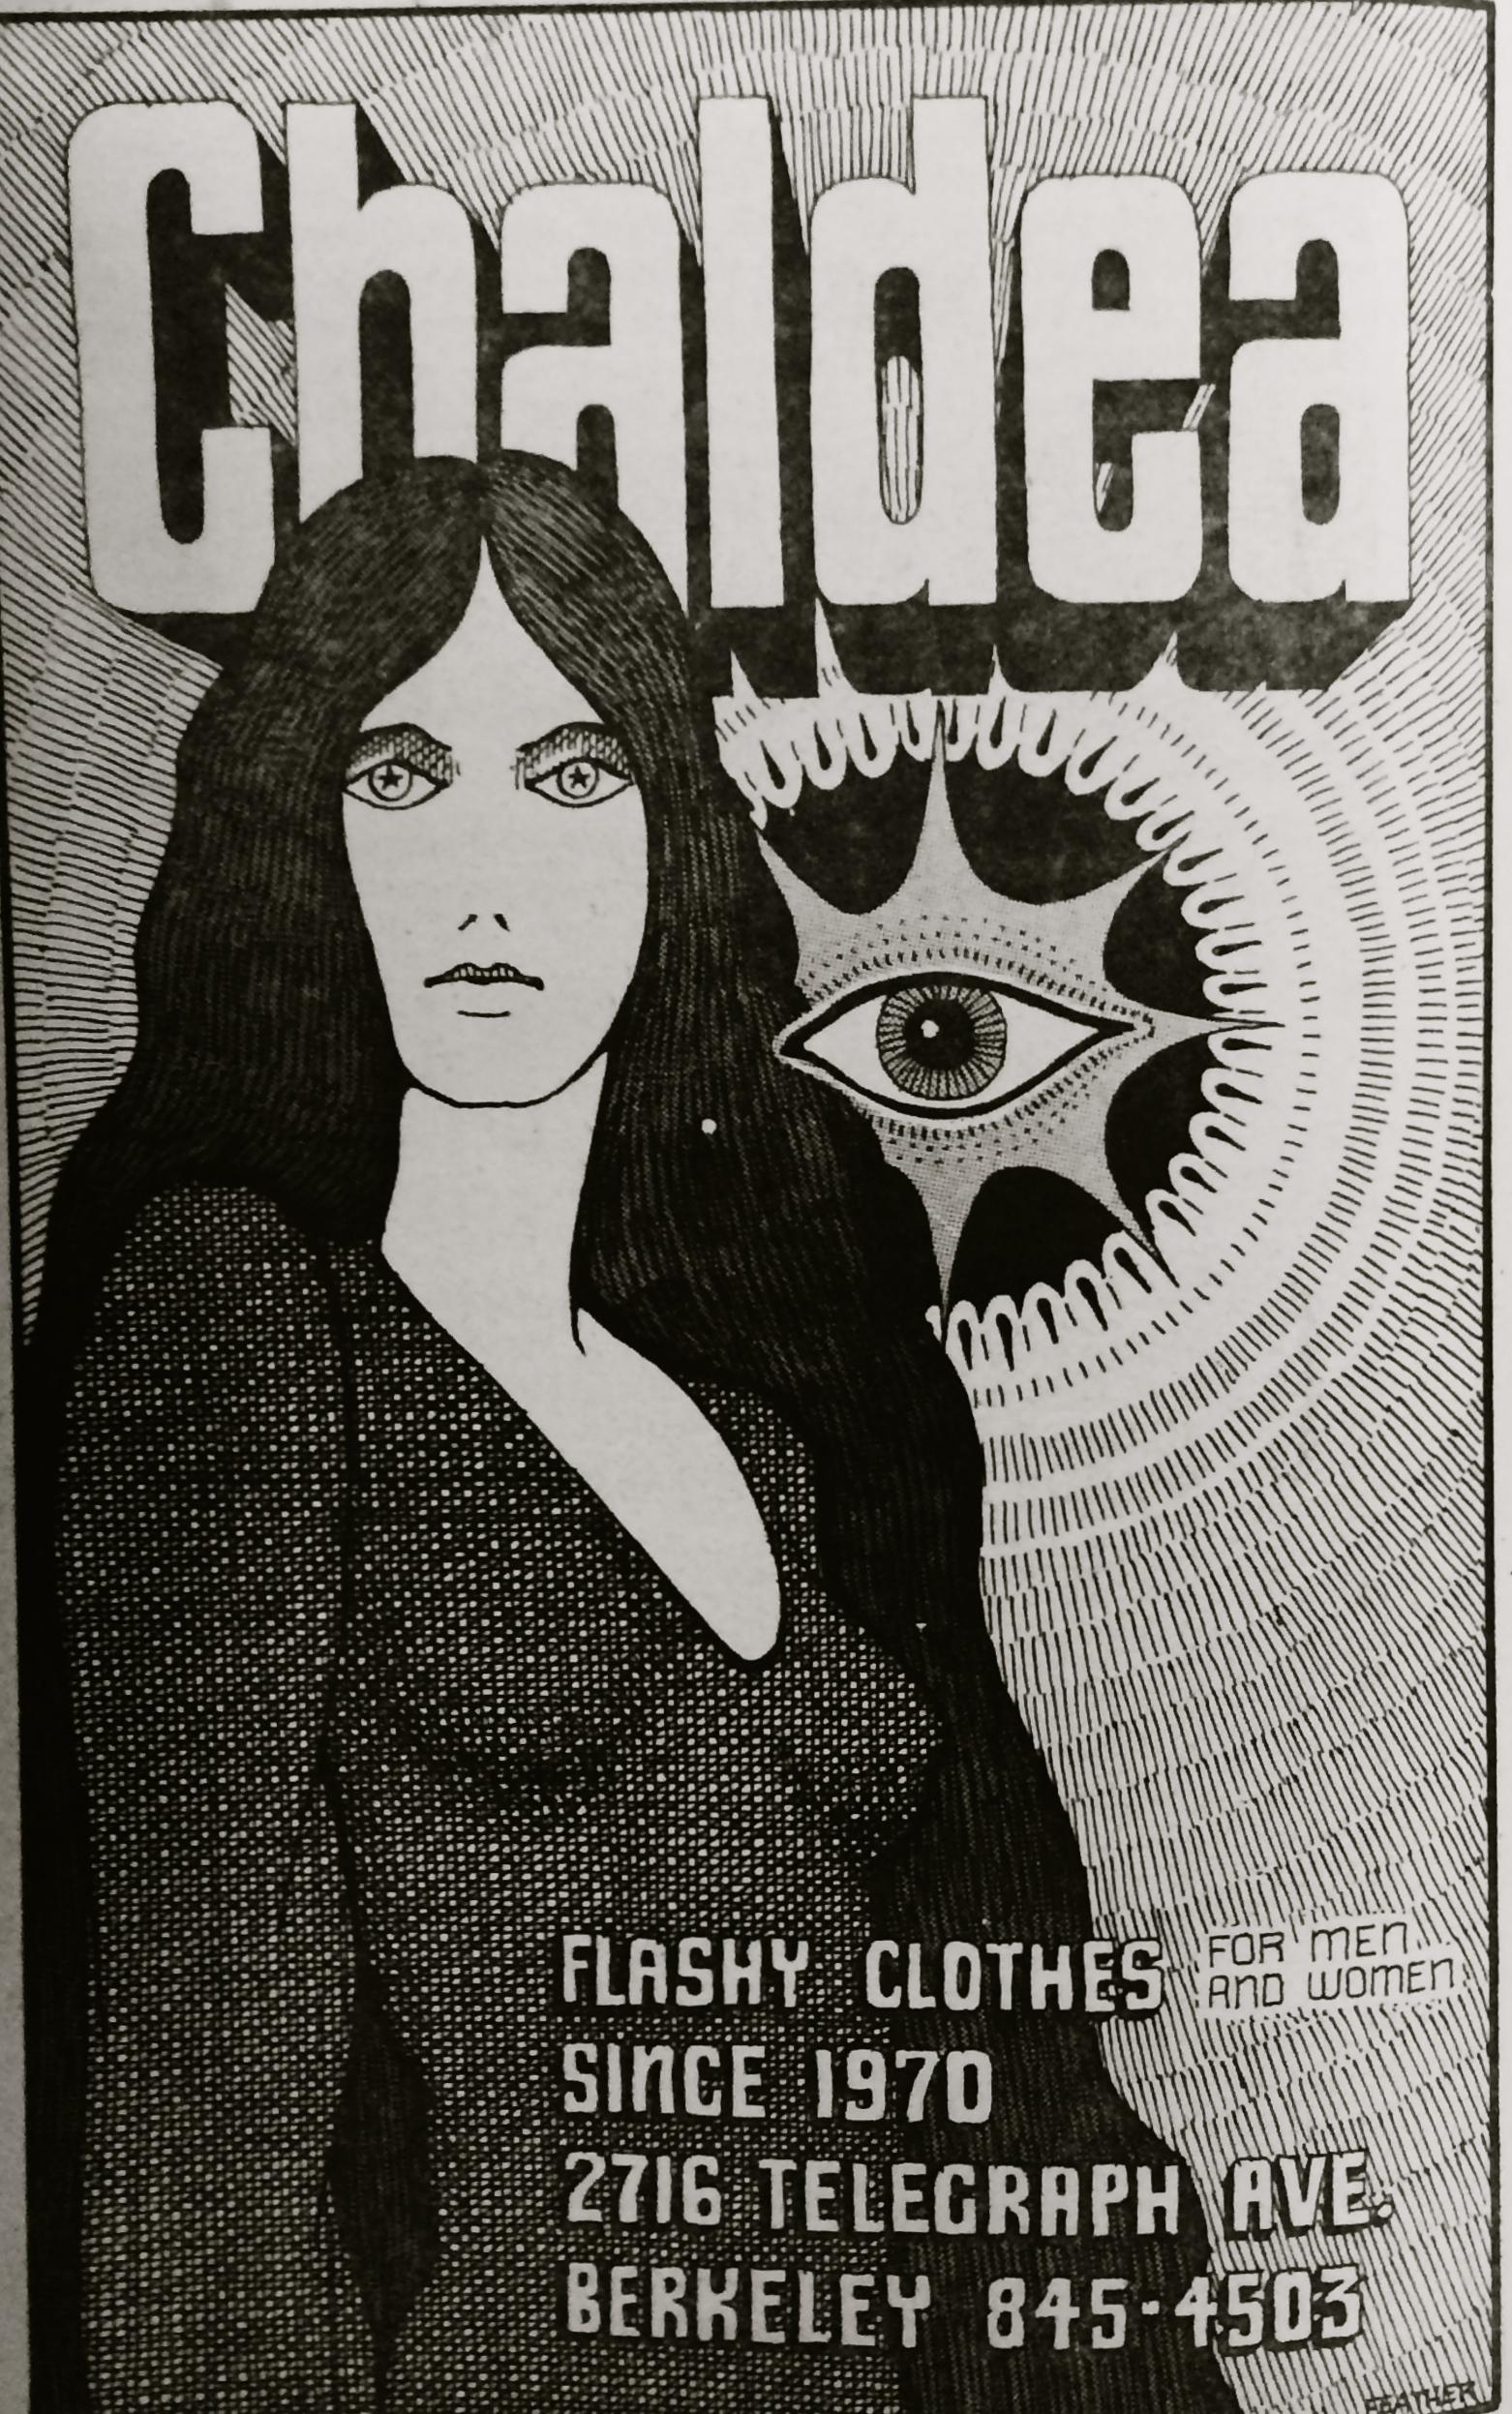 Chaldea 3 copy